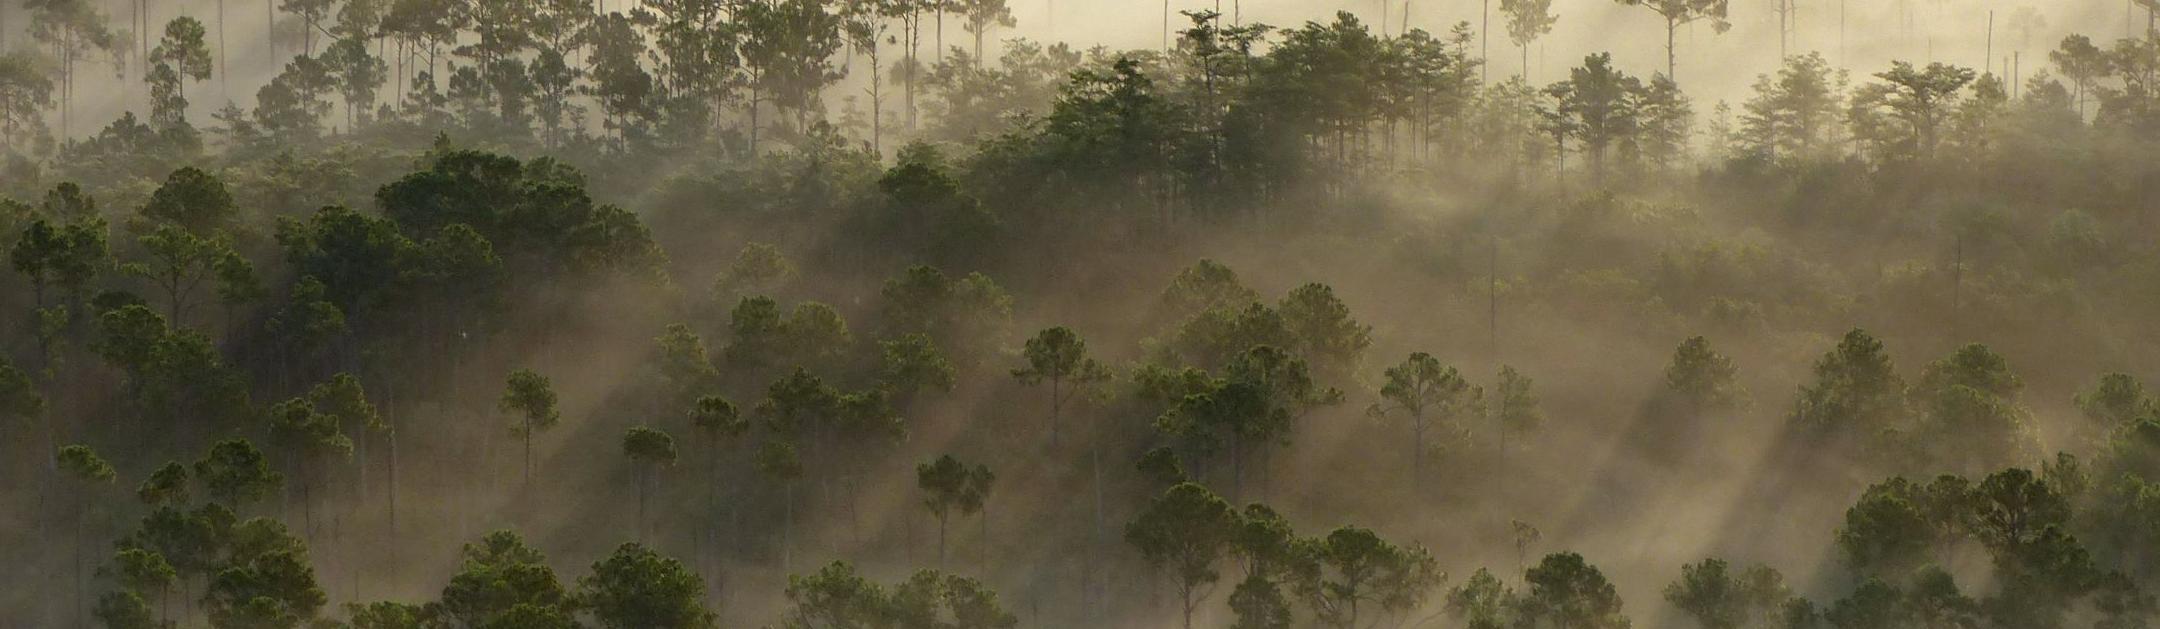 Big Cypress National Preserve (U.S. National Park Service)